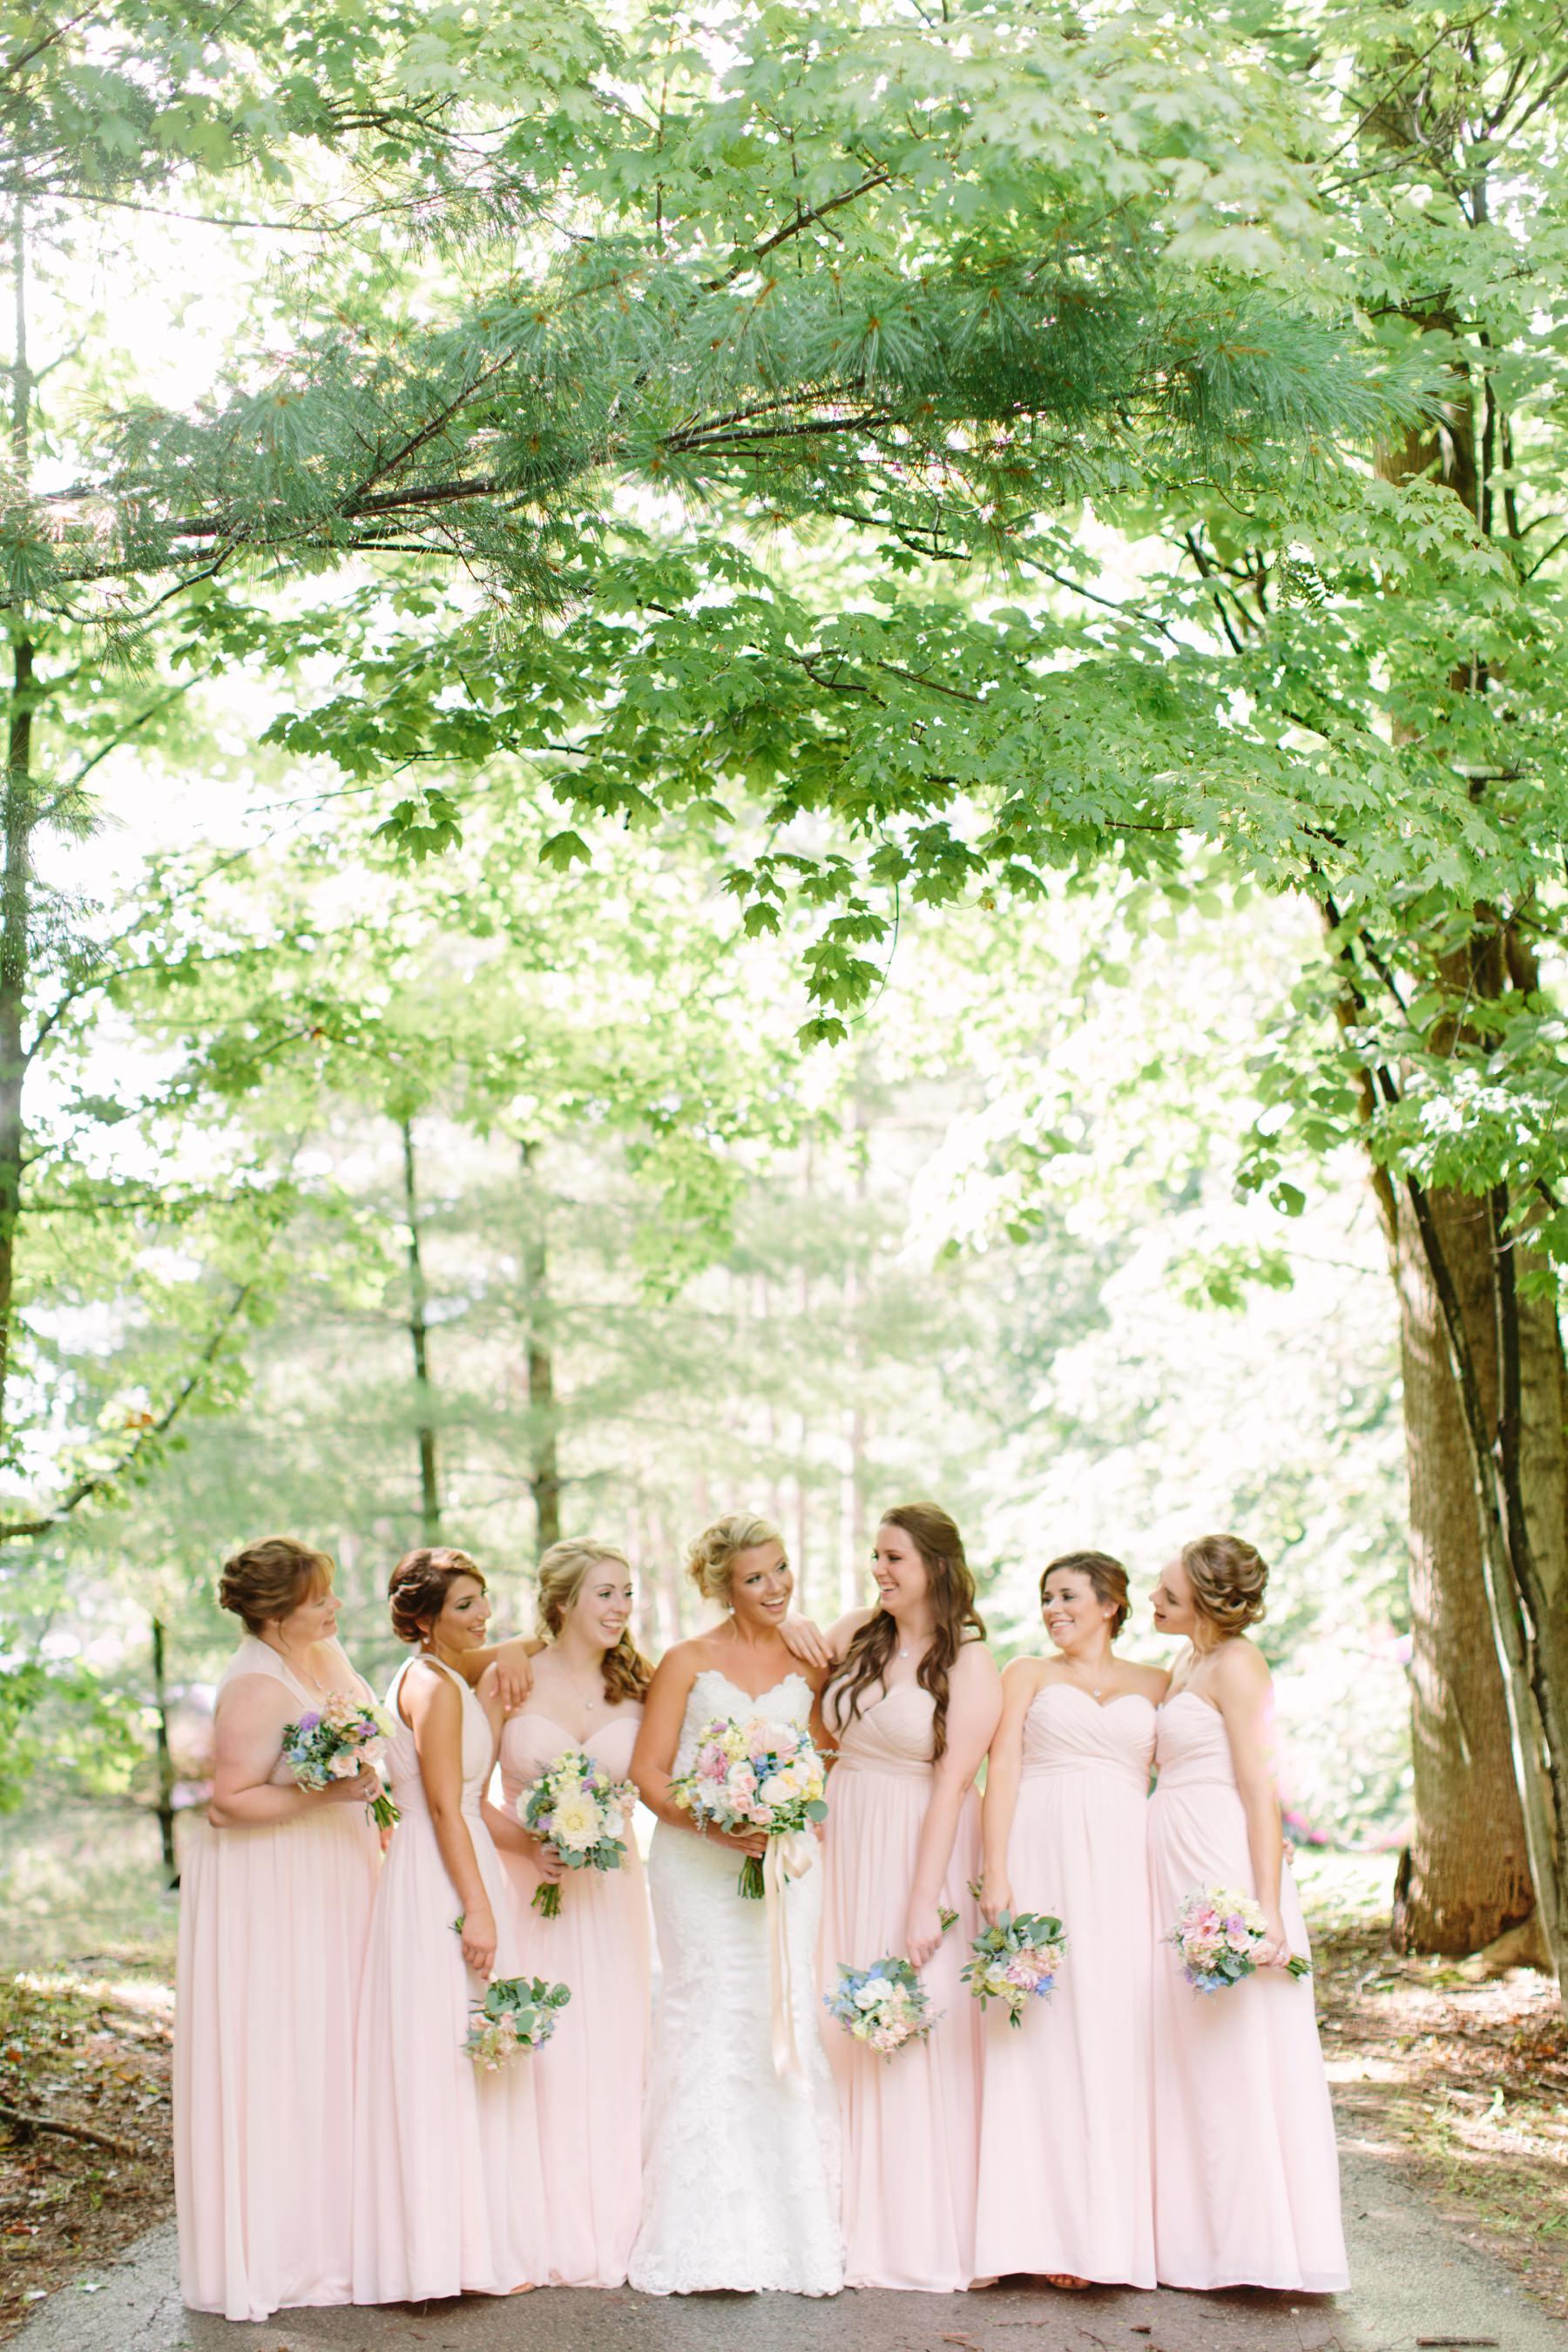 Tire Swing Photography | Timeless Charm Wedding | Camden, Ohio 10